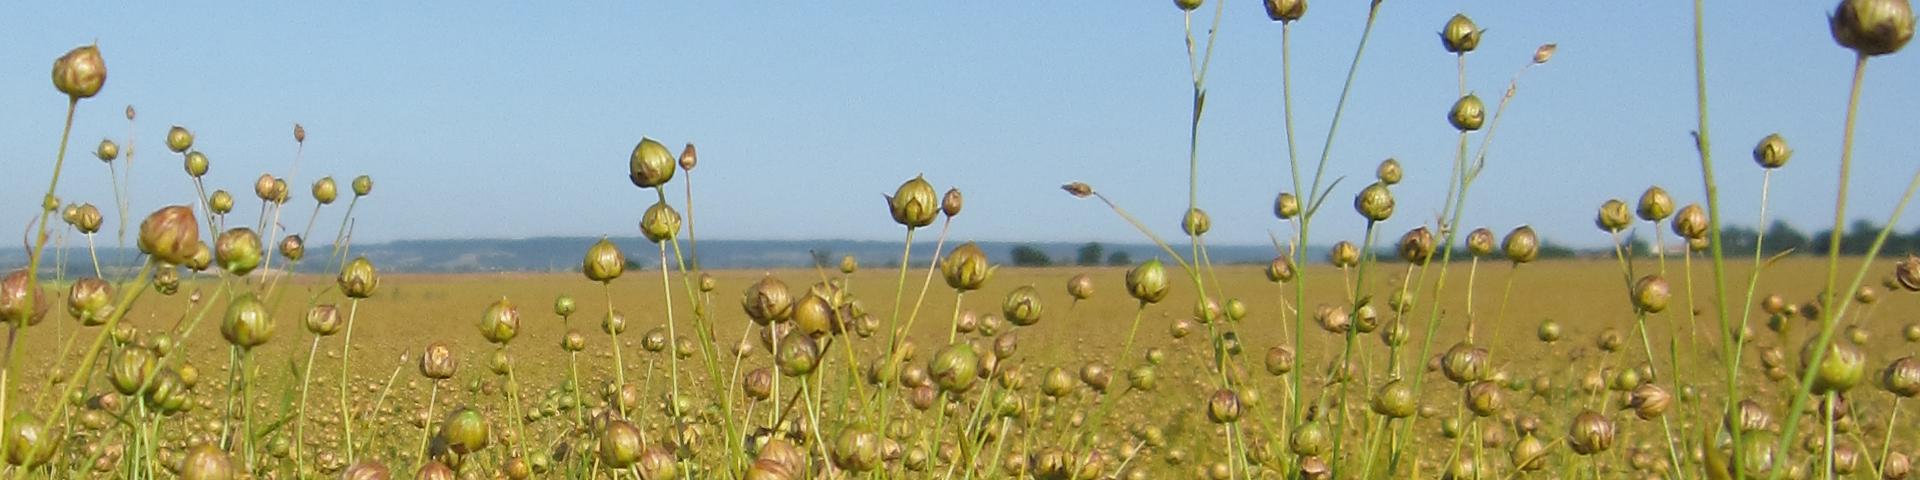 bannergrasses1